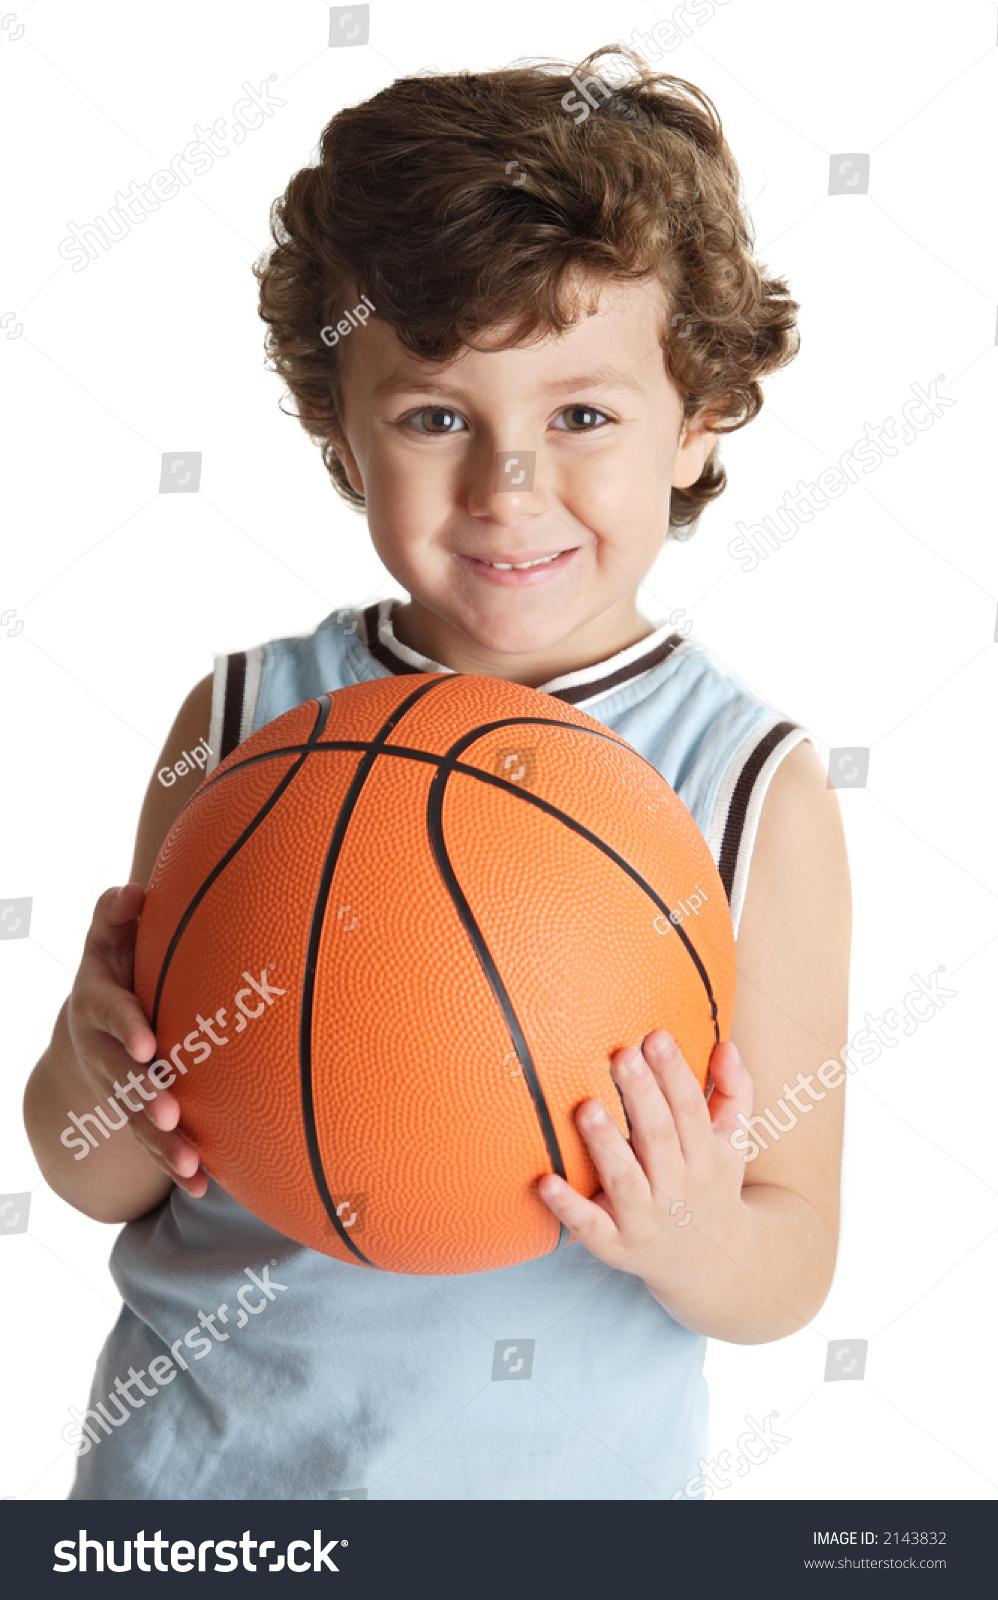 wallpaper ball boy basketball - photo #48